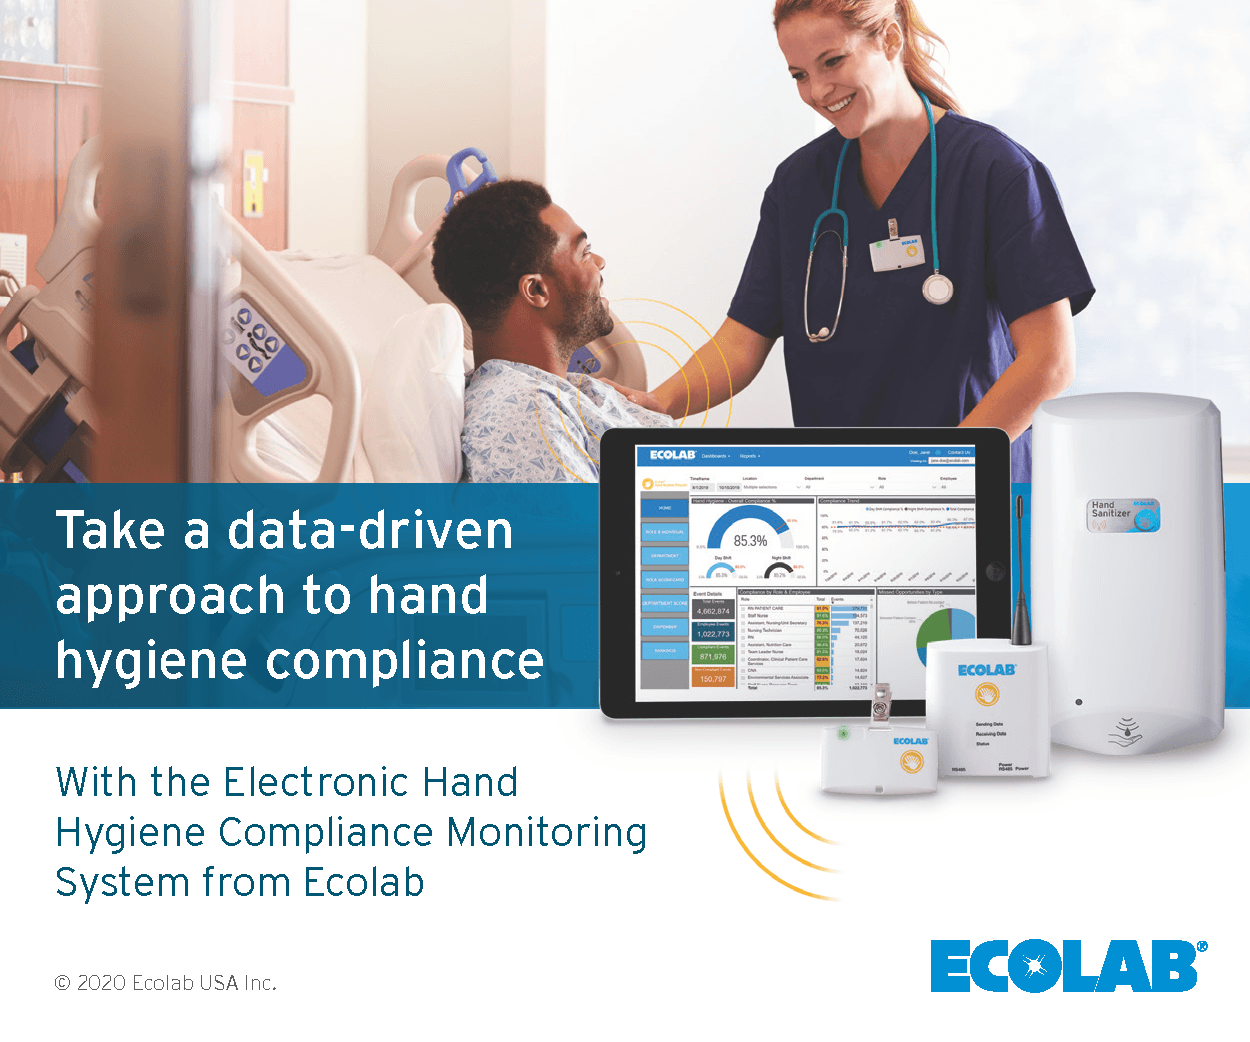 Take a data-driven approach to hand hygiene compliance